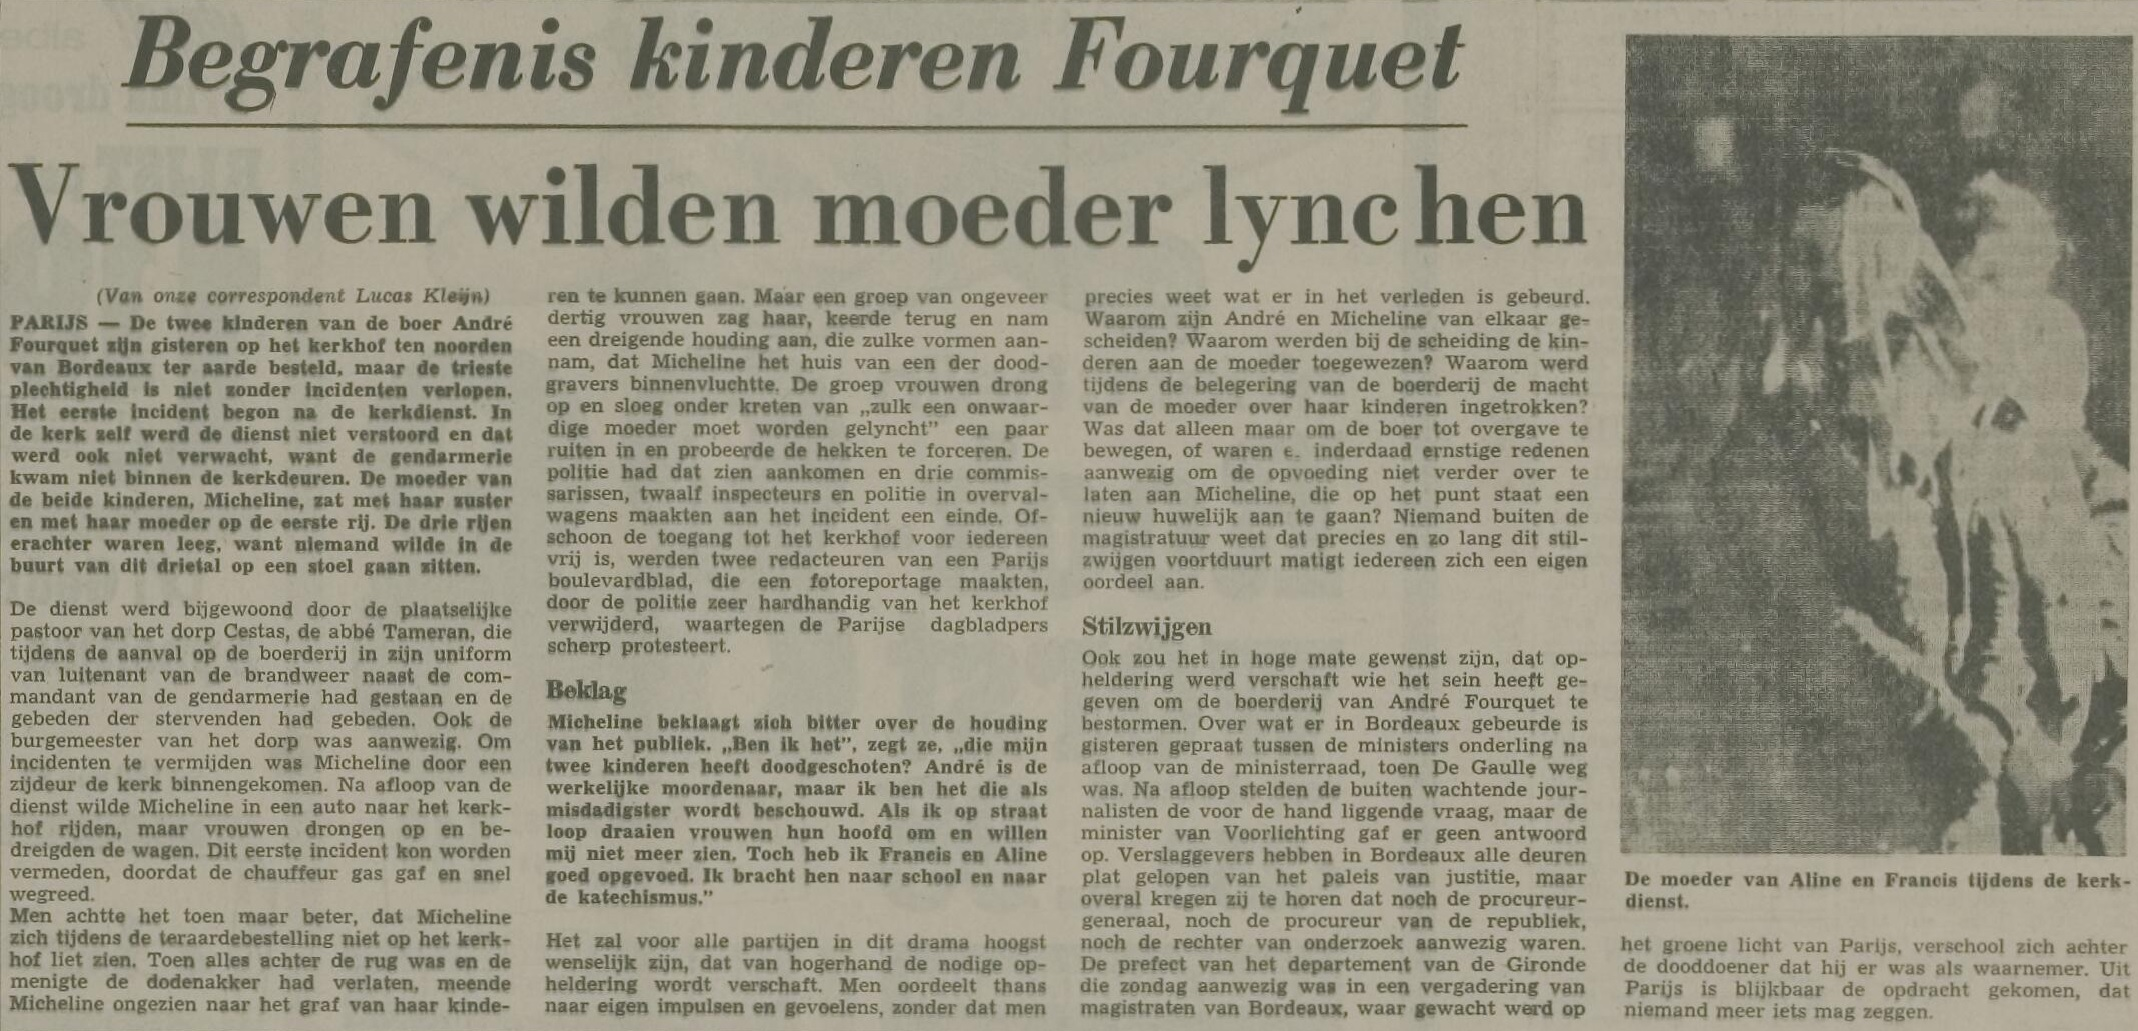 De Leidse Courant, nº 17679, 20/02/1969, p. 5